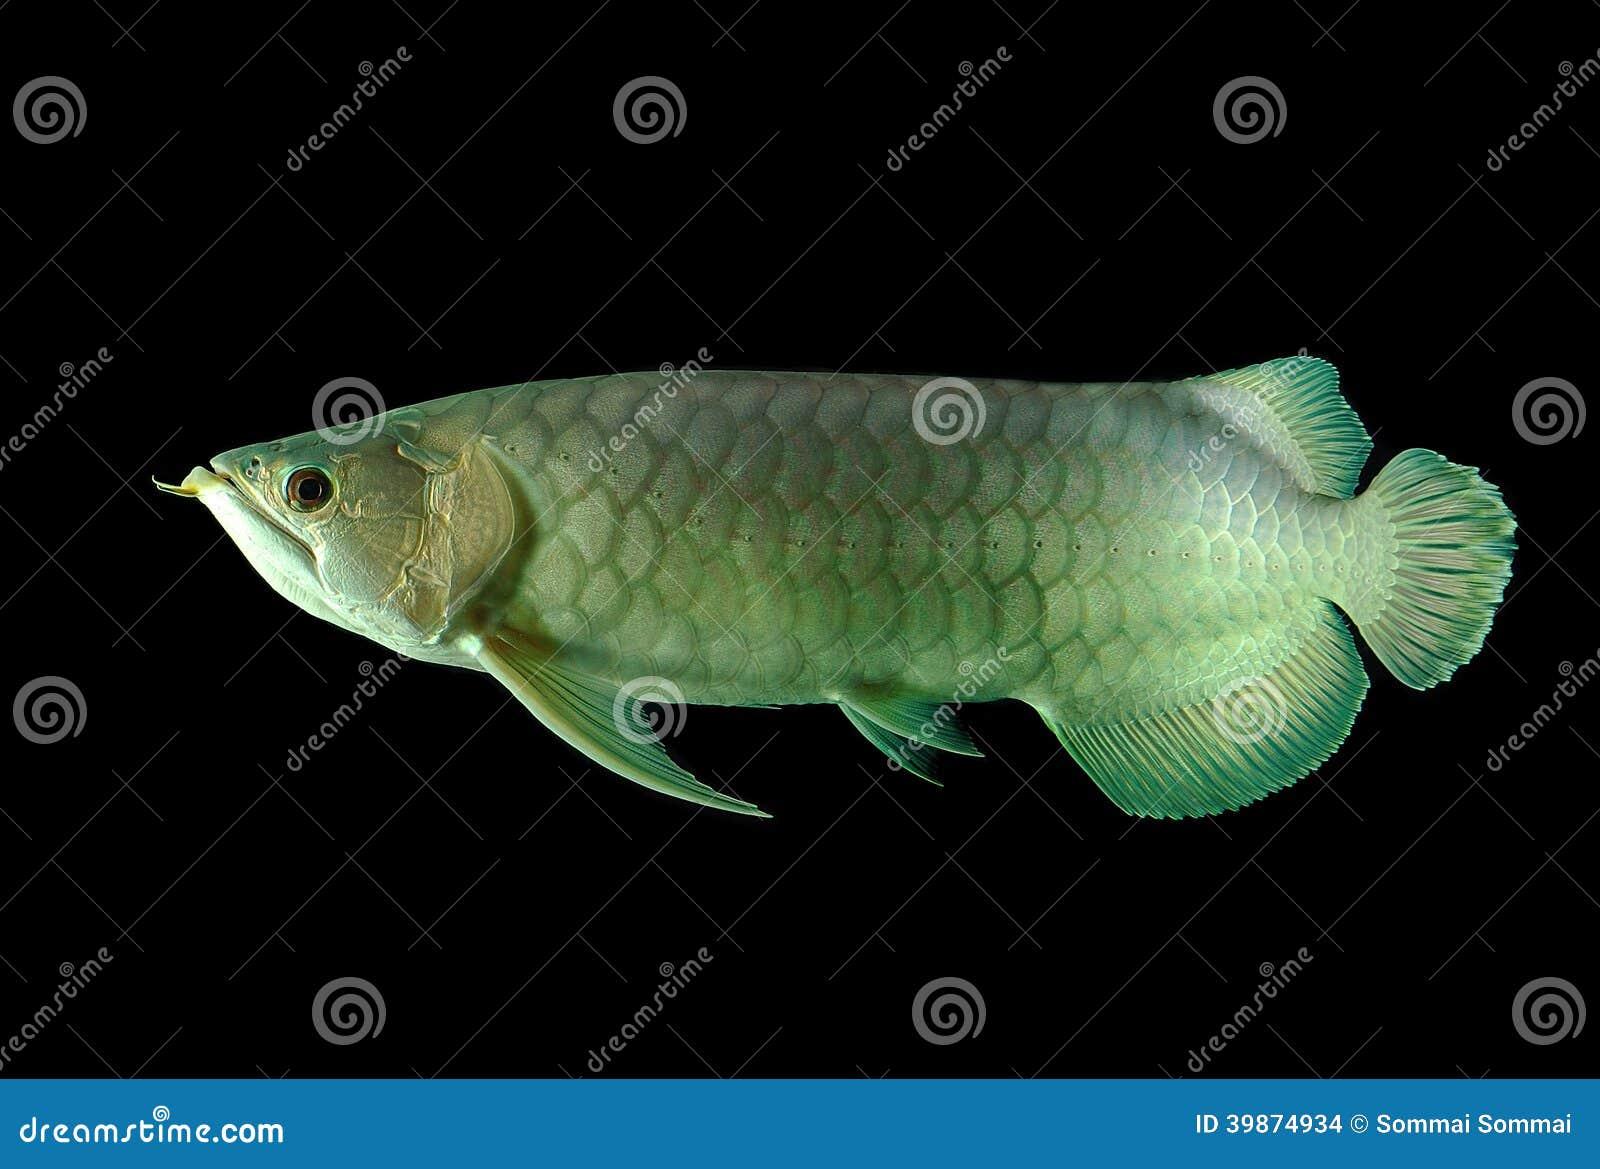 Arowana fish stock photo. Image of swimming, beauty, color - 39874934